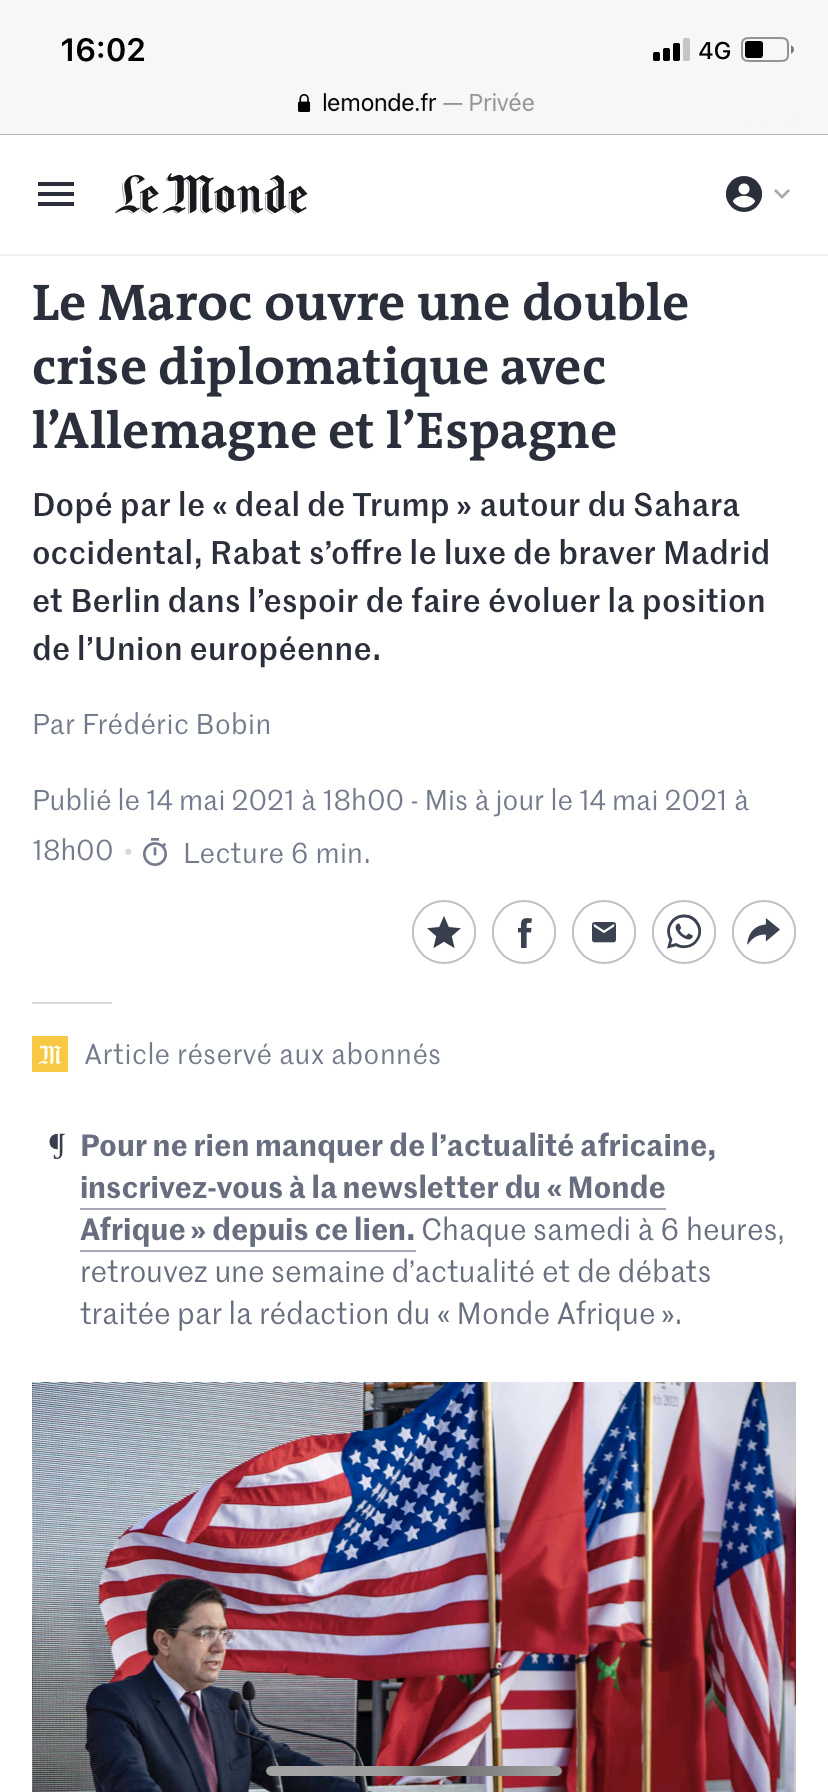 Diplomatie marocaine - Relations internationales 127